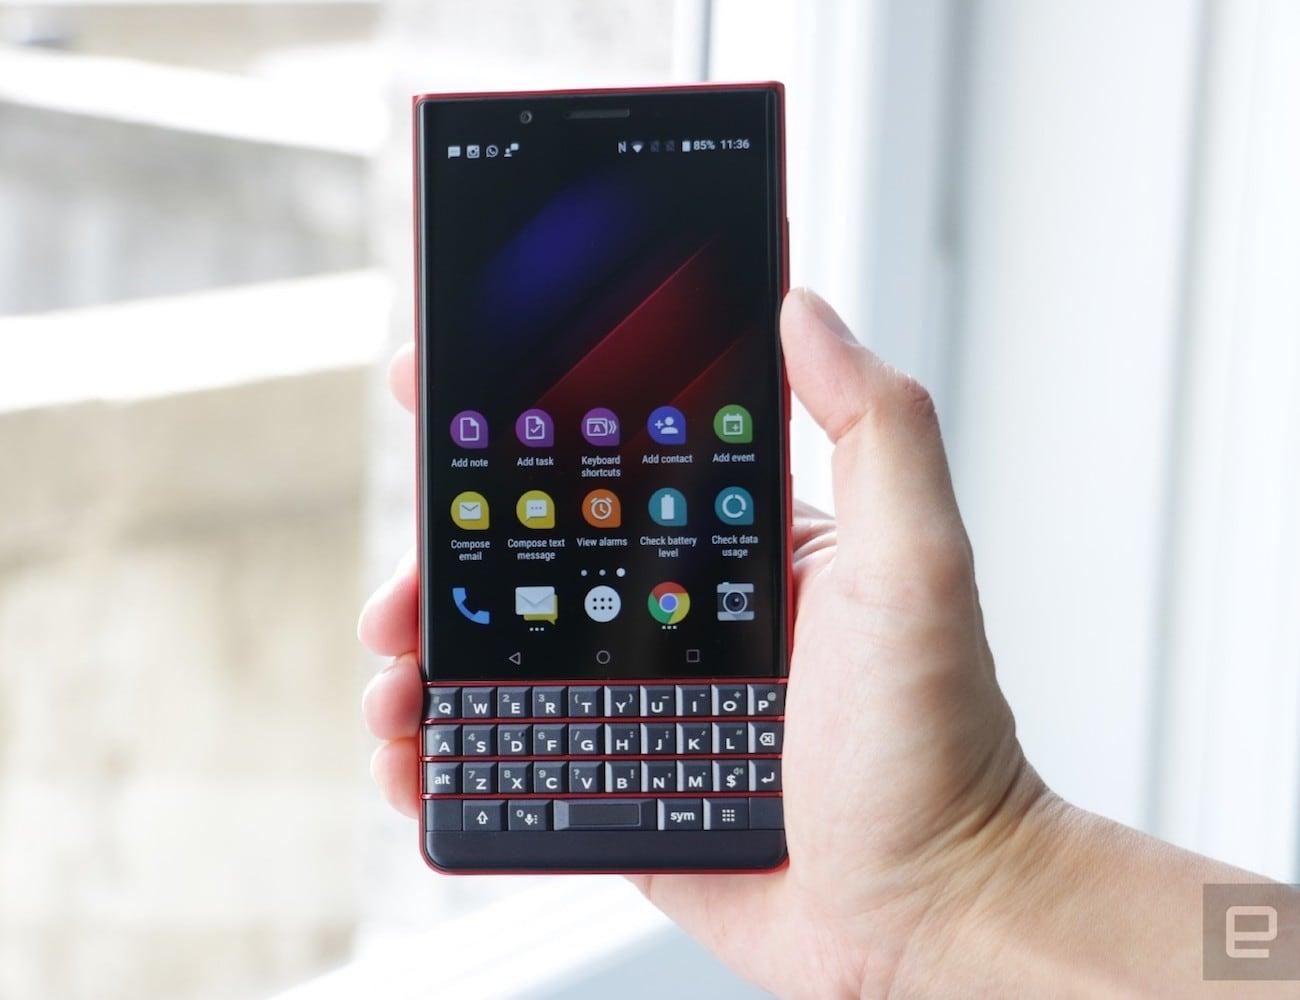 BlackBerry KEY2 LE Physical Keyboard Smartphone